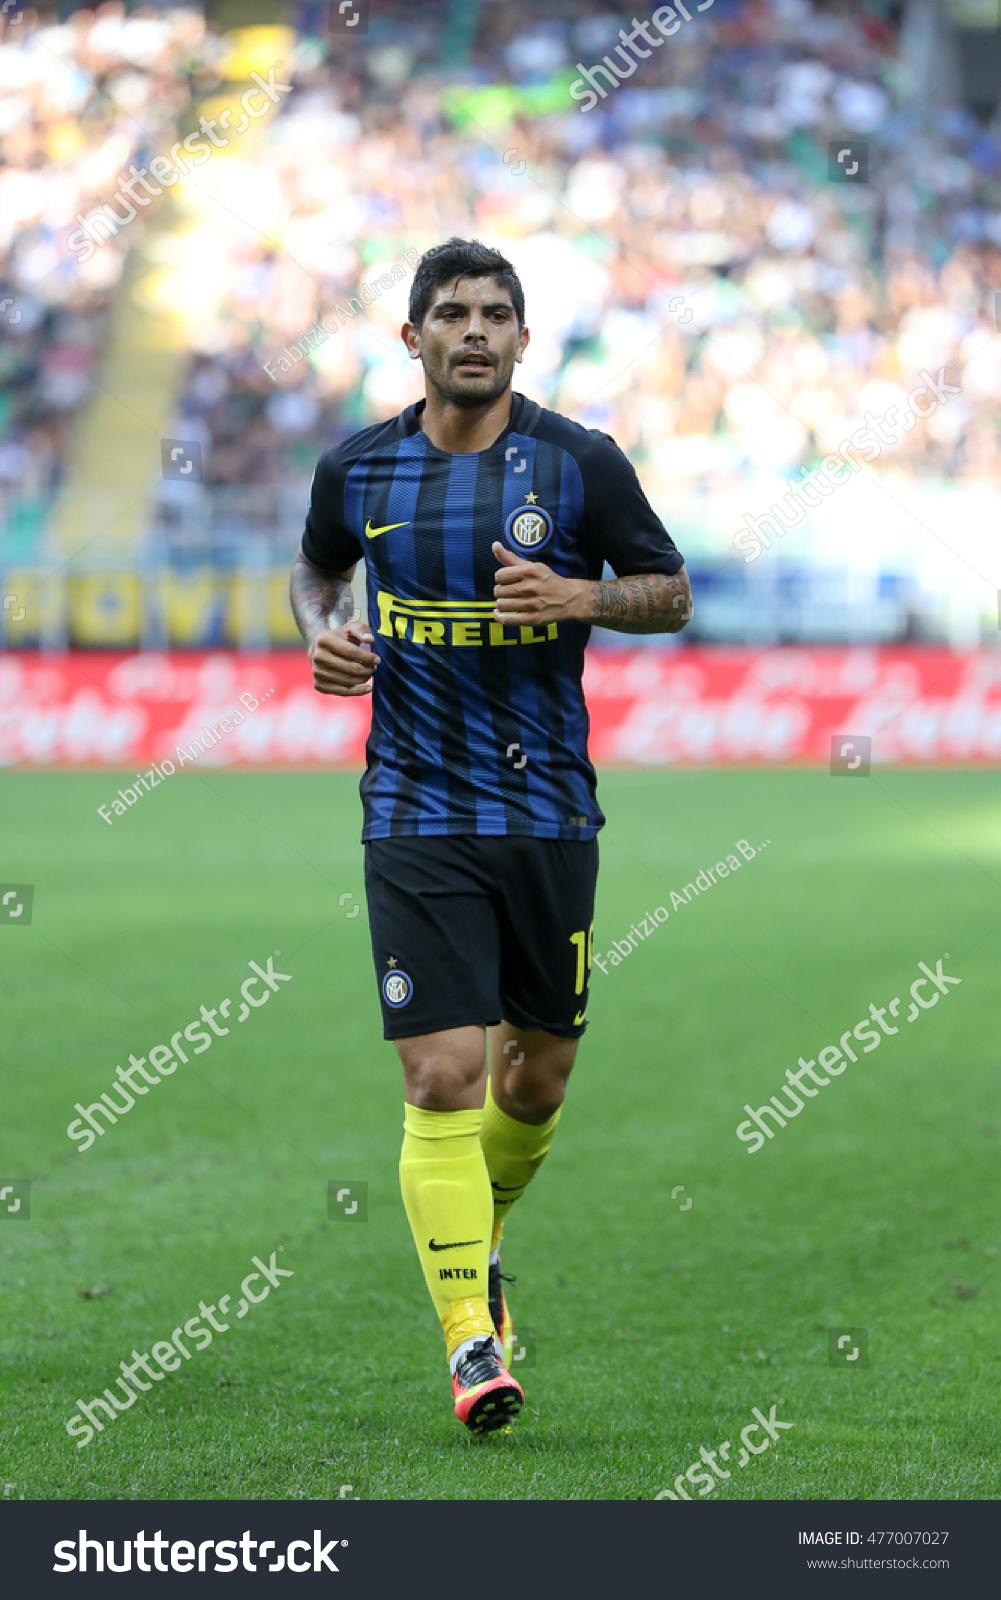 Milan Italy August 2016 Italy League Stock